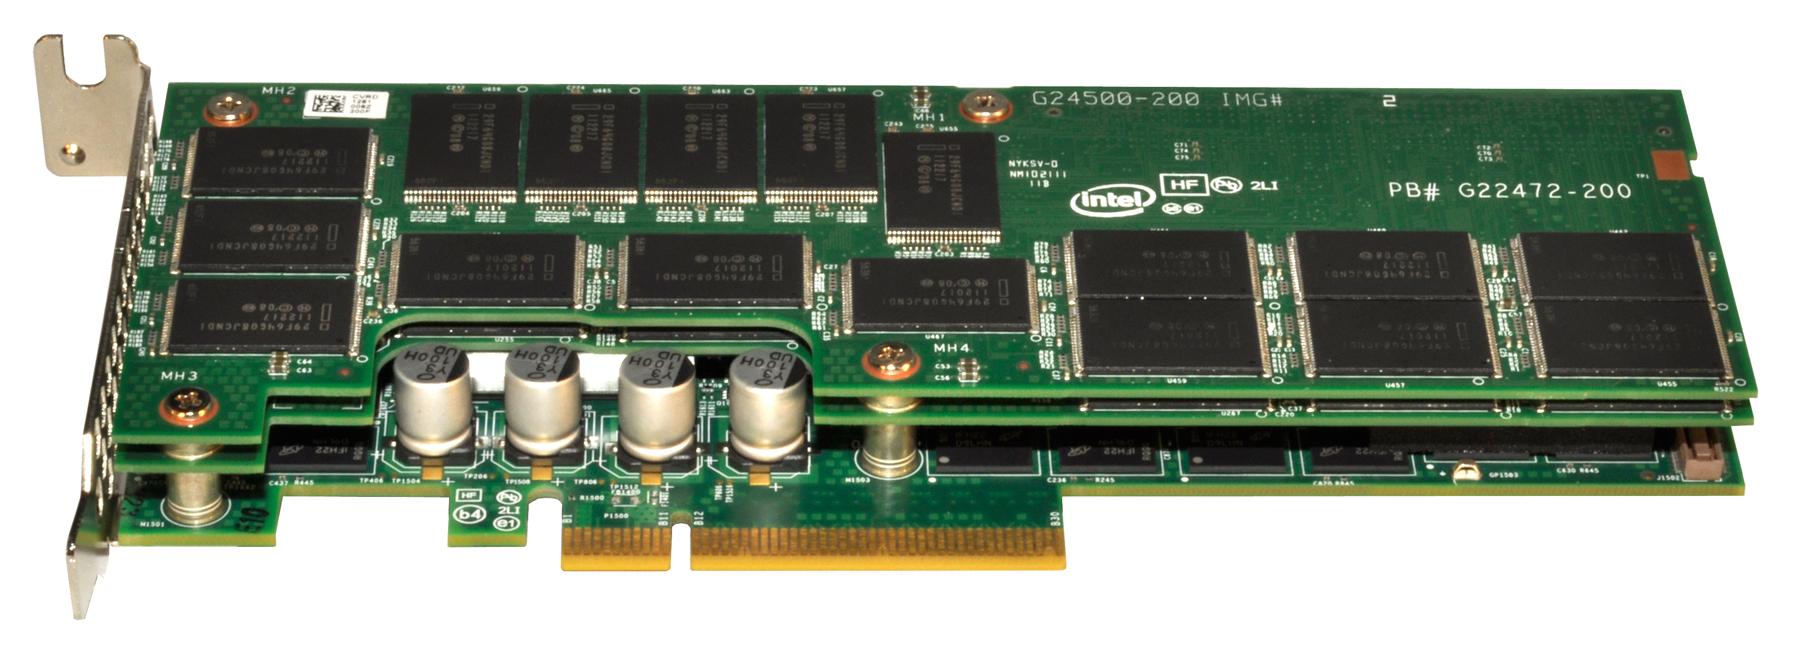 Intel-SSD-910-angled_view_sm.jpg